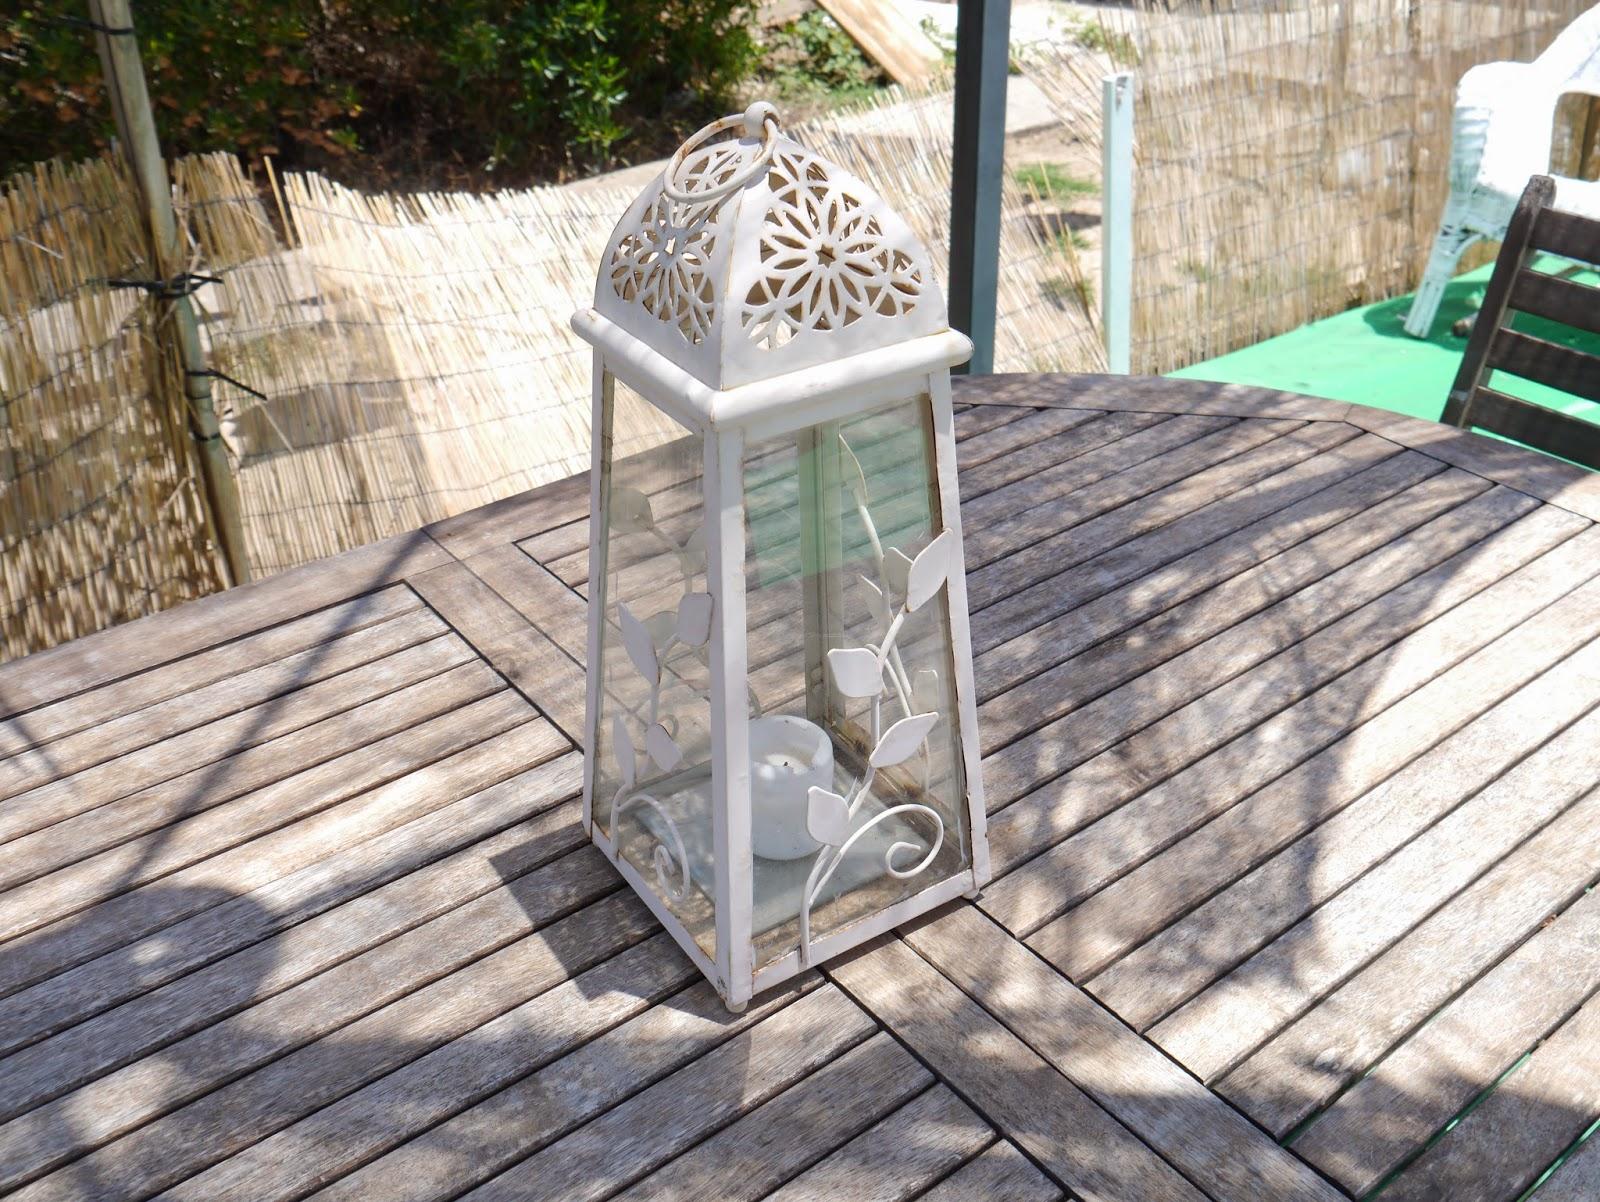 photo of a lantern